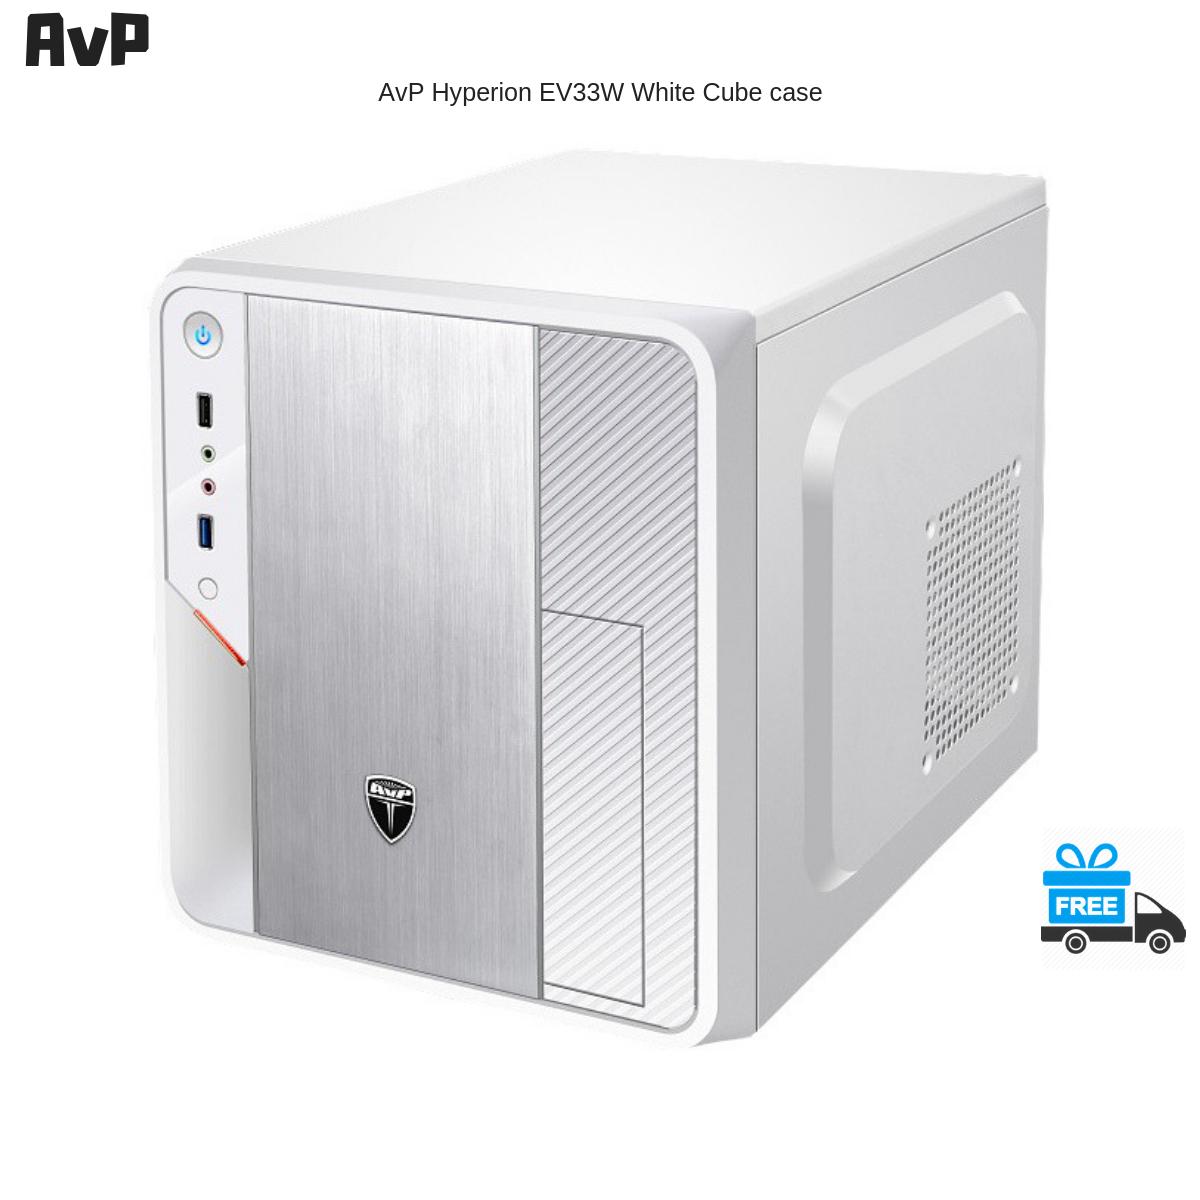 AvP Hyperion EV33W White Cube case